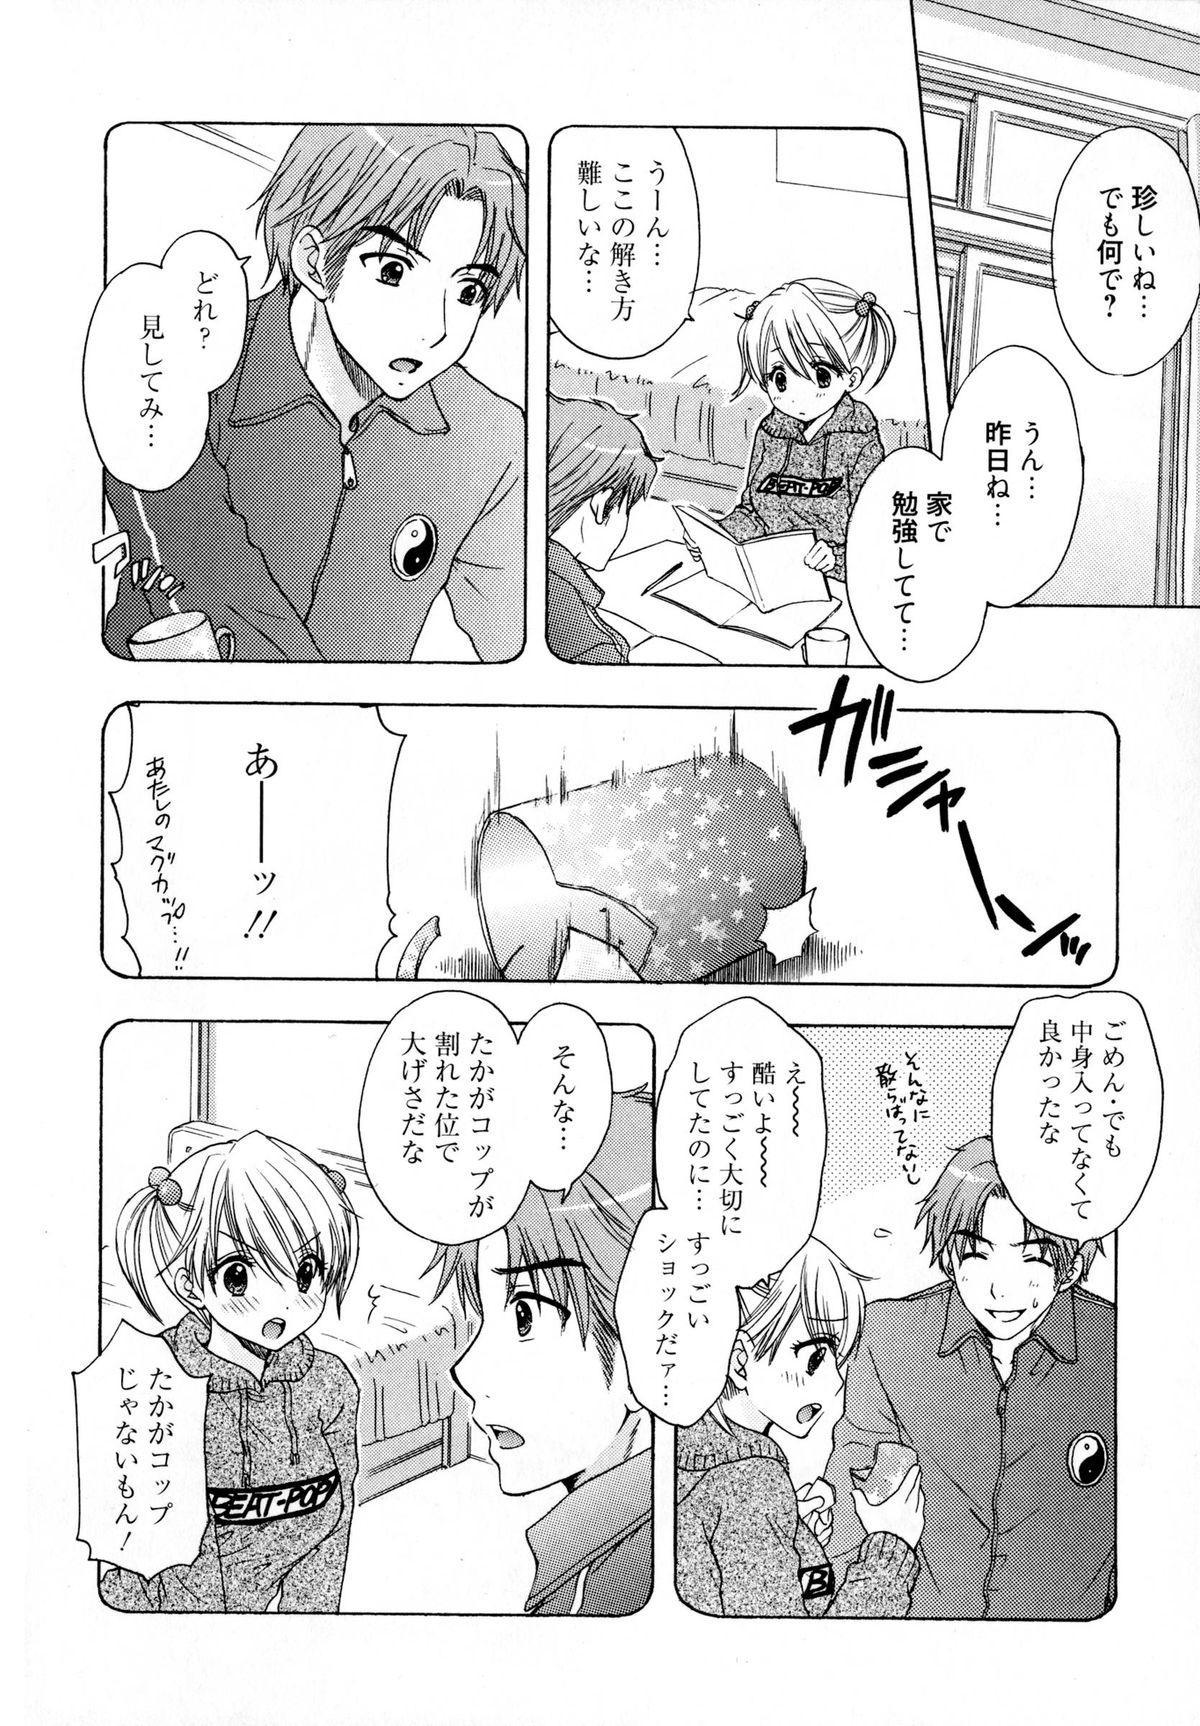 The Great Escape 4 Shokai Genteiban 89